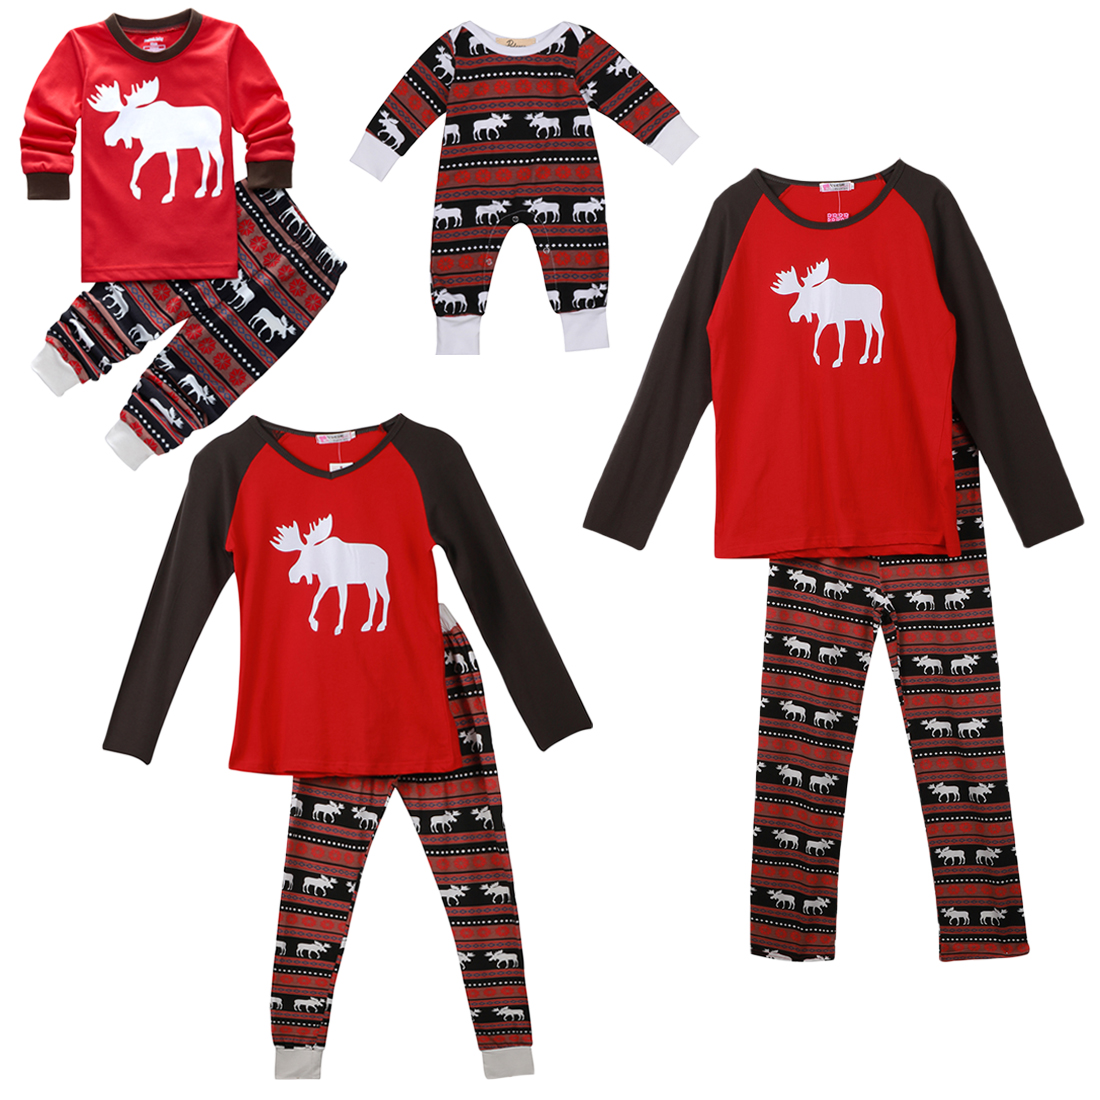 Xmas Moose Fairy Christmas Family Matching Pajamas Set Adult Kids Sleepwear Nightwear Pjs Photgraphy Prop Party Clothing